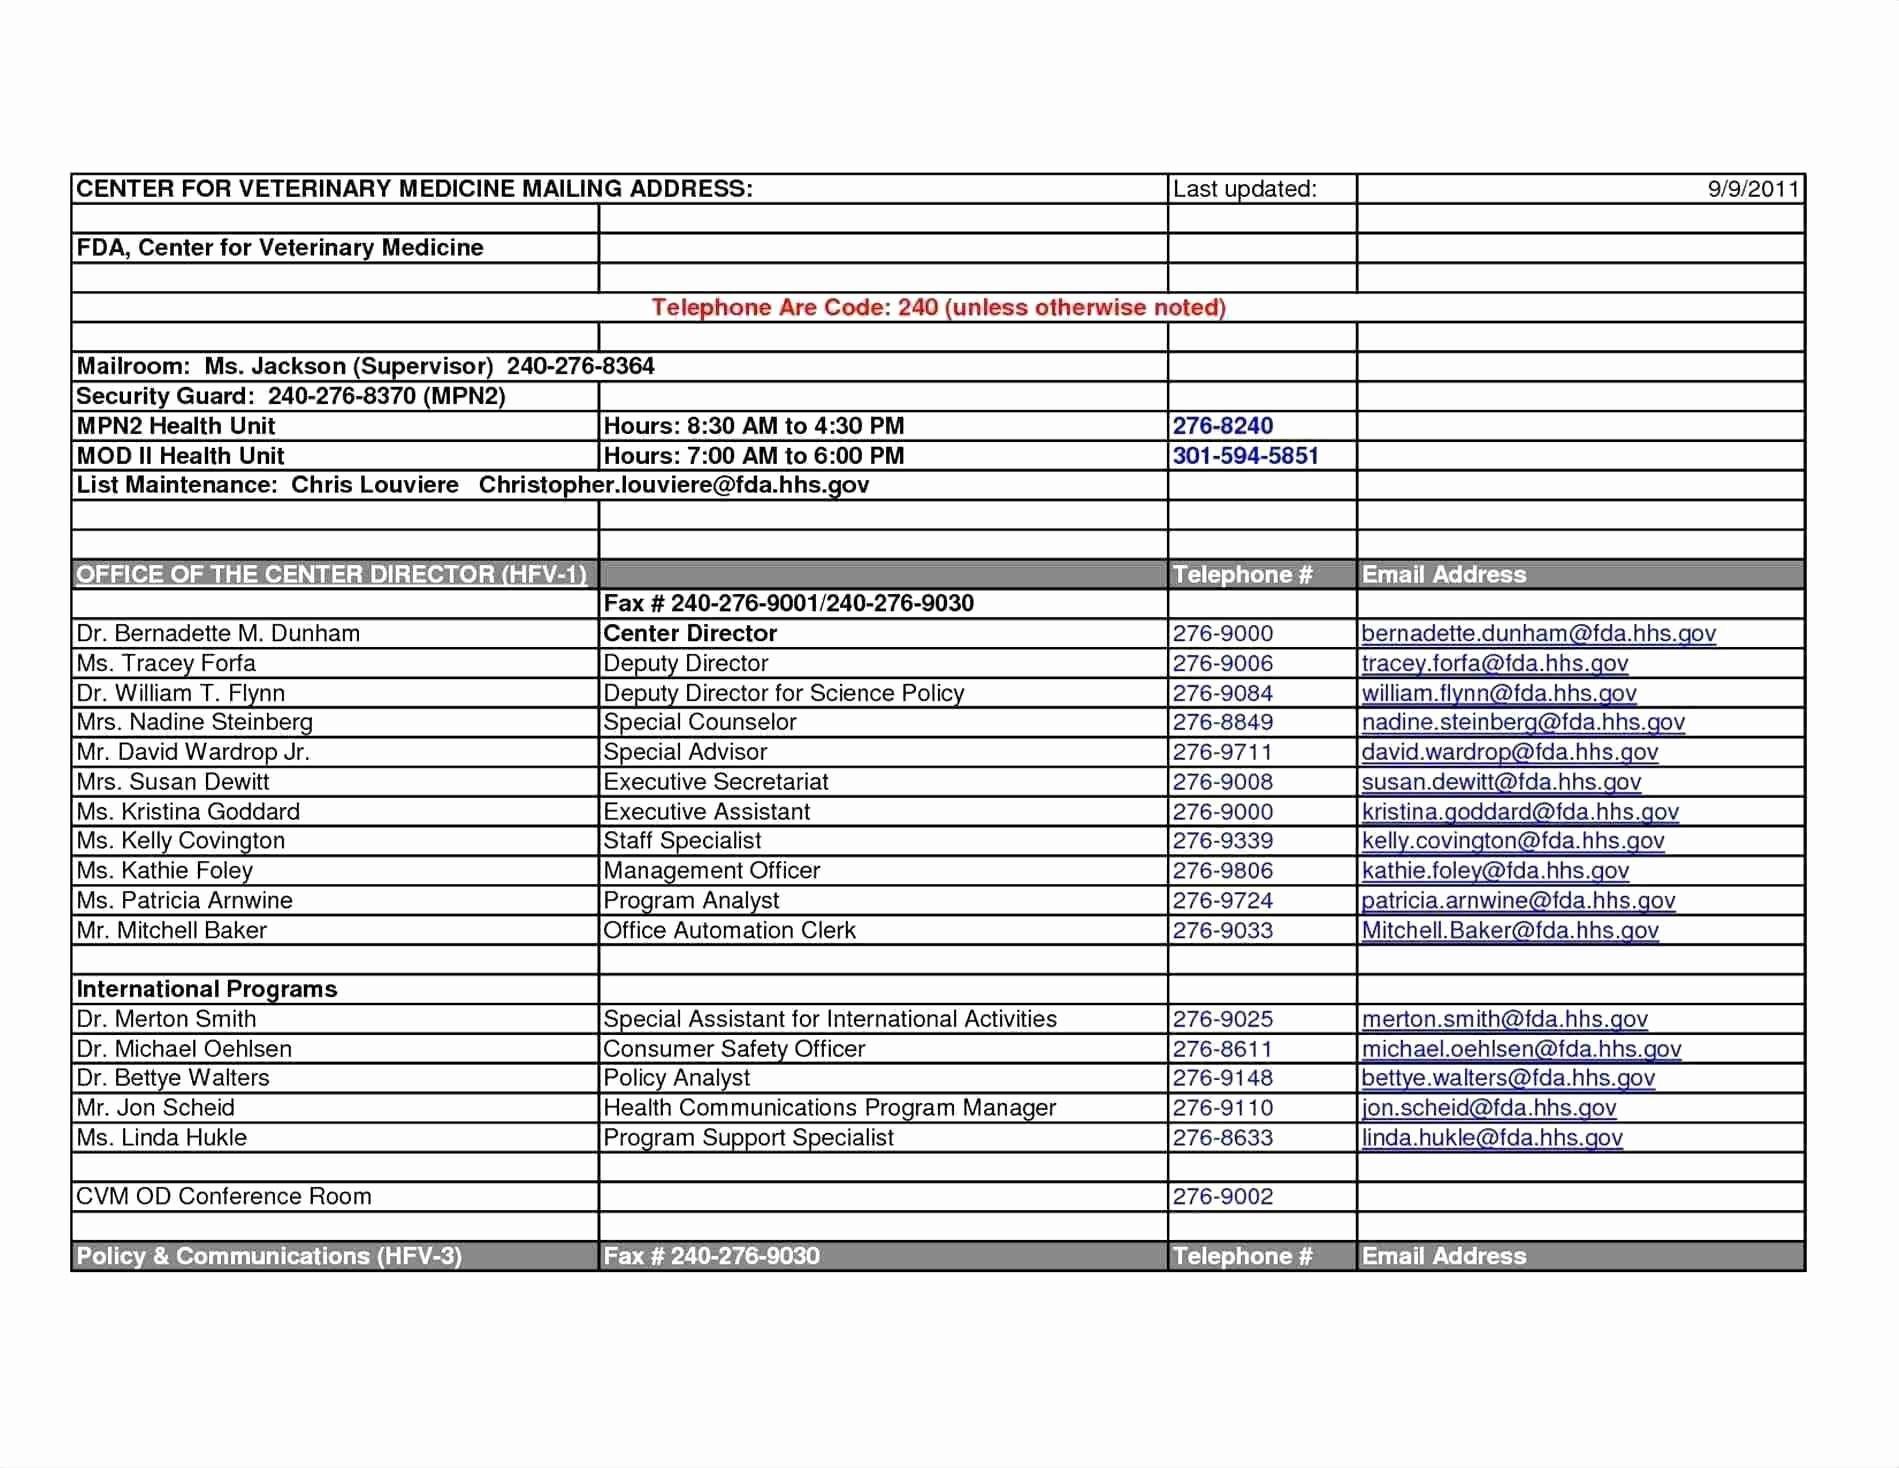 March Calendar 2018 Mejores Y Más Novedosos Calendar 2017 Template Pdf Lovely Fresh Blank Calendar Template for Of March Calendar 2018 Más Recientes Calendar Template to Print Luxury Chore Chart Unique Chore Calendar